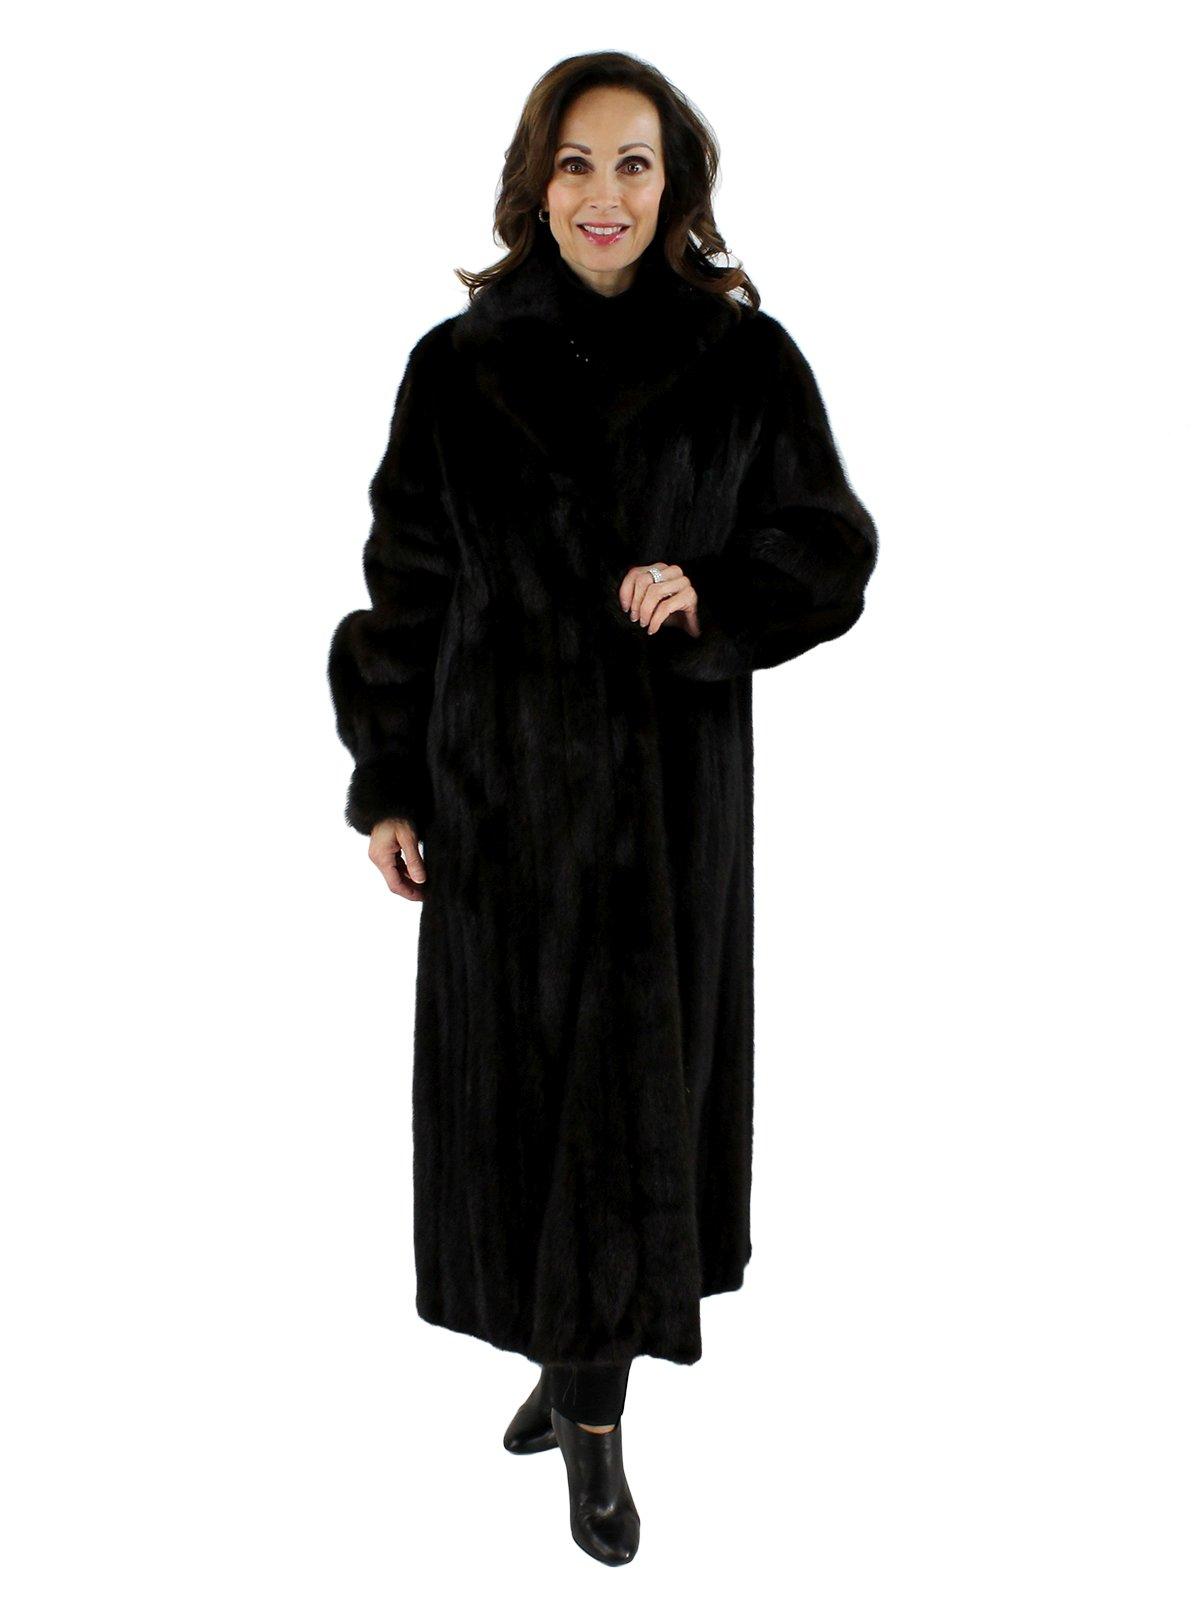 Mink Coat Value >> Female Ranch Mink Fur Coat Women S Medium Estate Furs